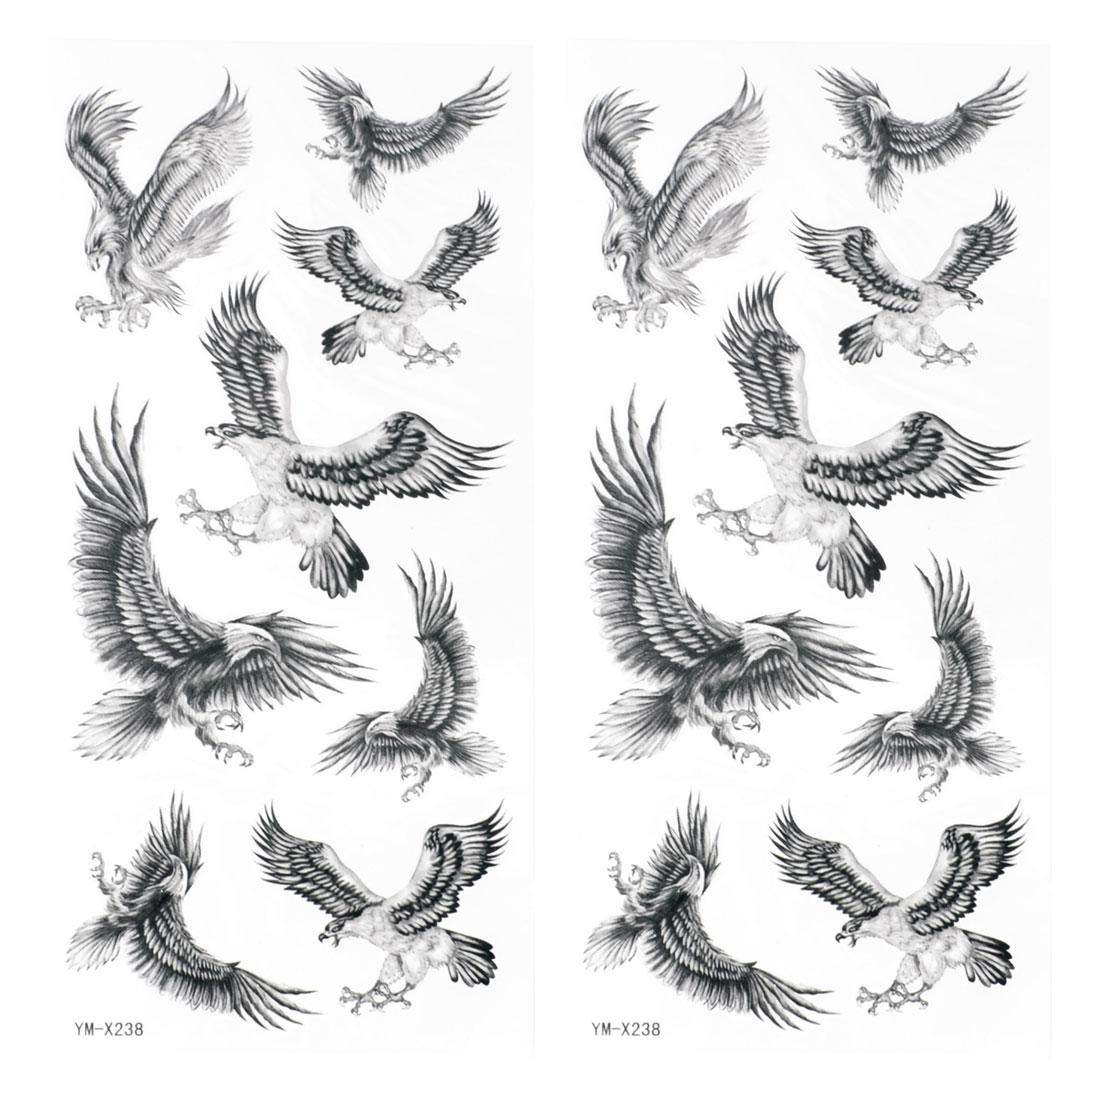 Black Eagle Pattern Waterproof Temporary Tattoo Transfer Sticker 2 Pcs